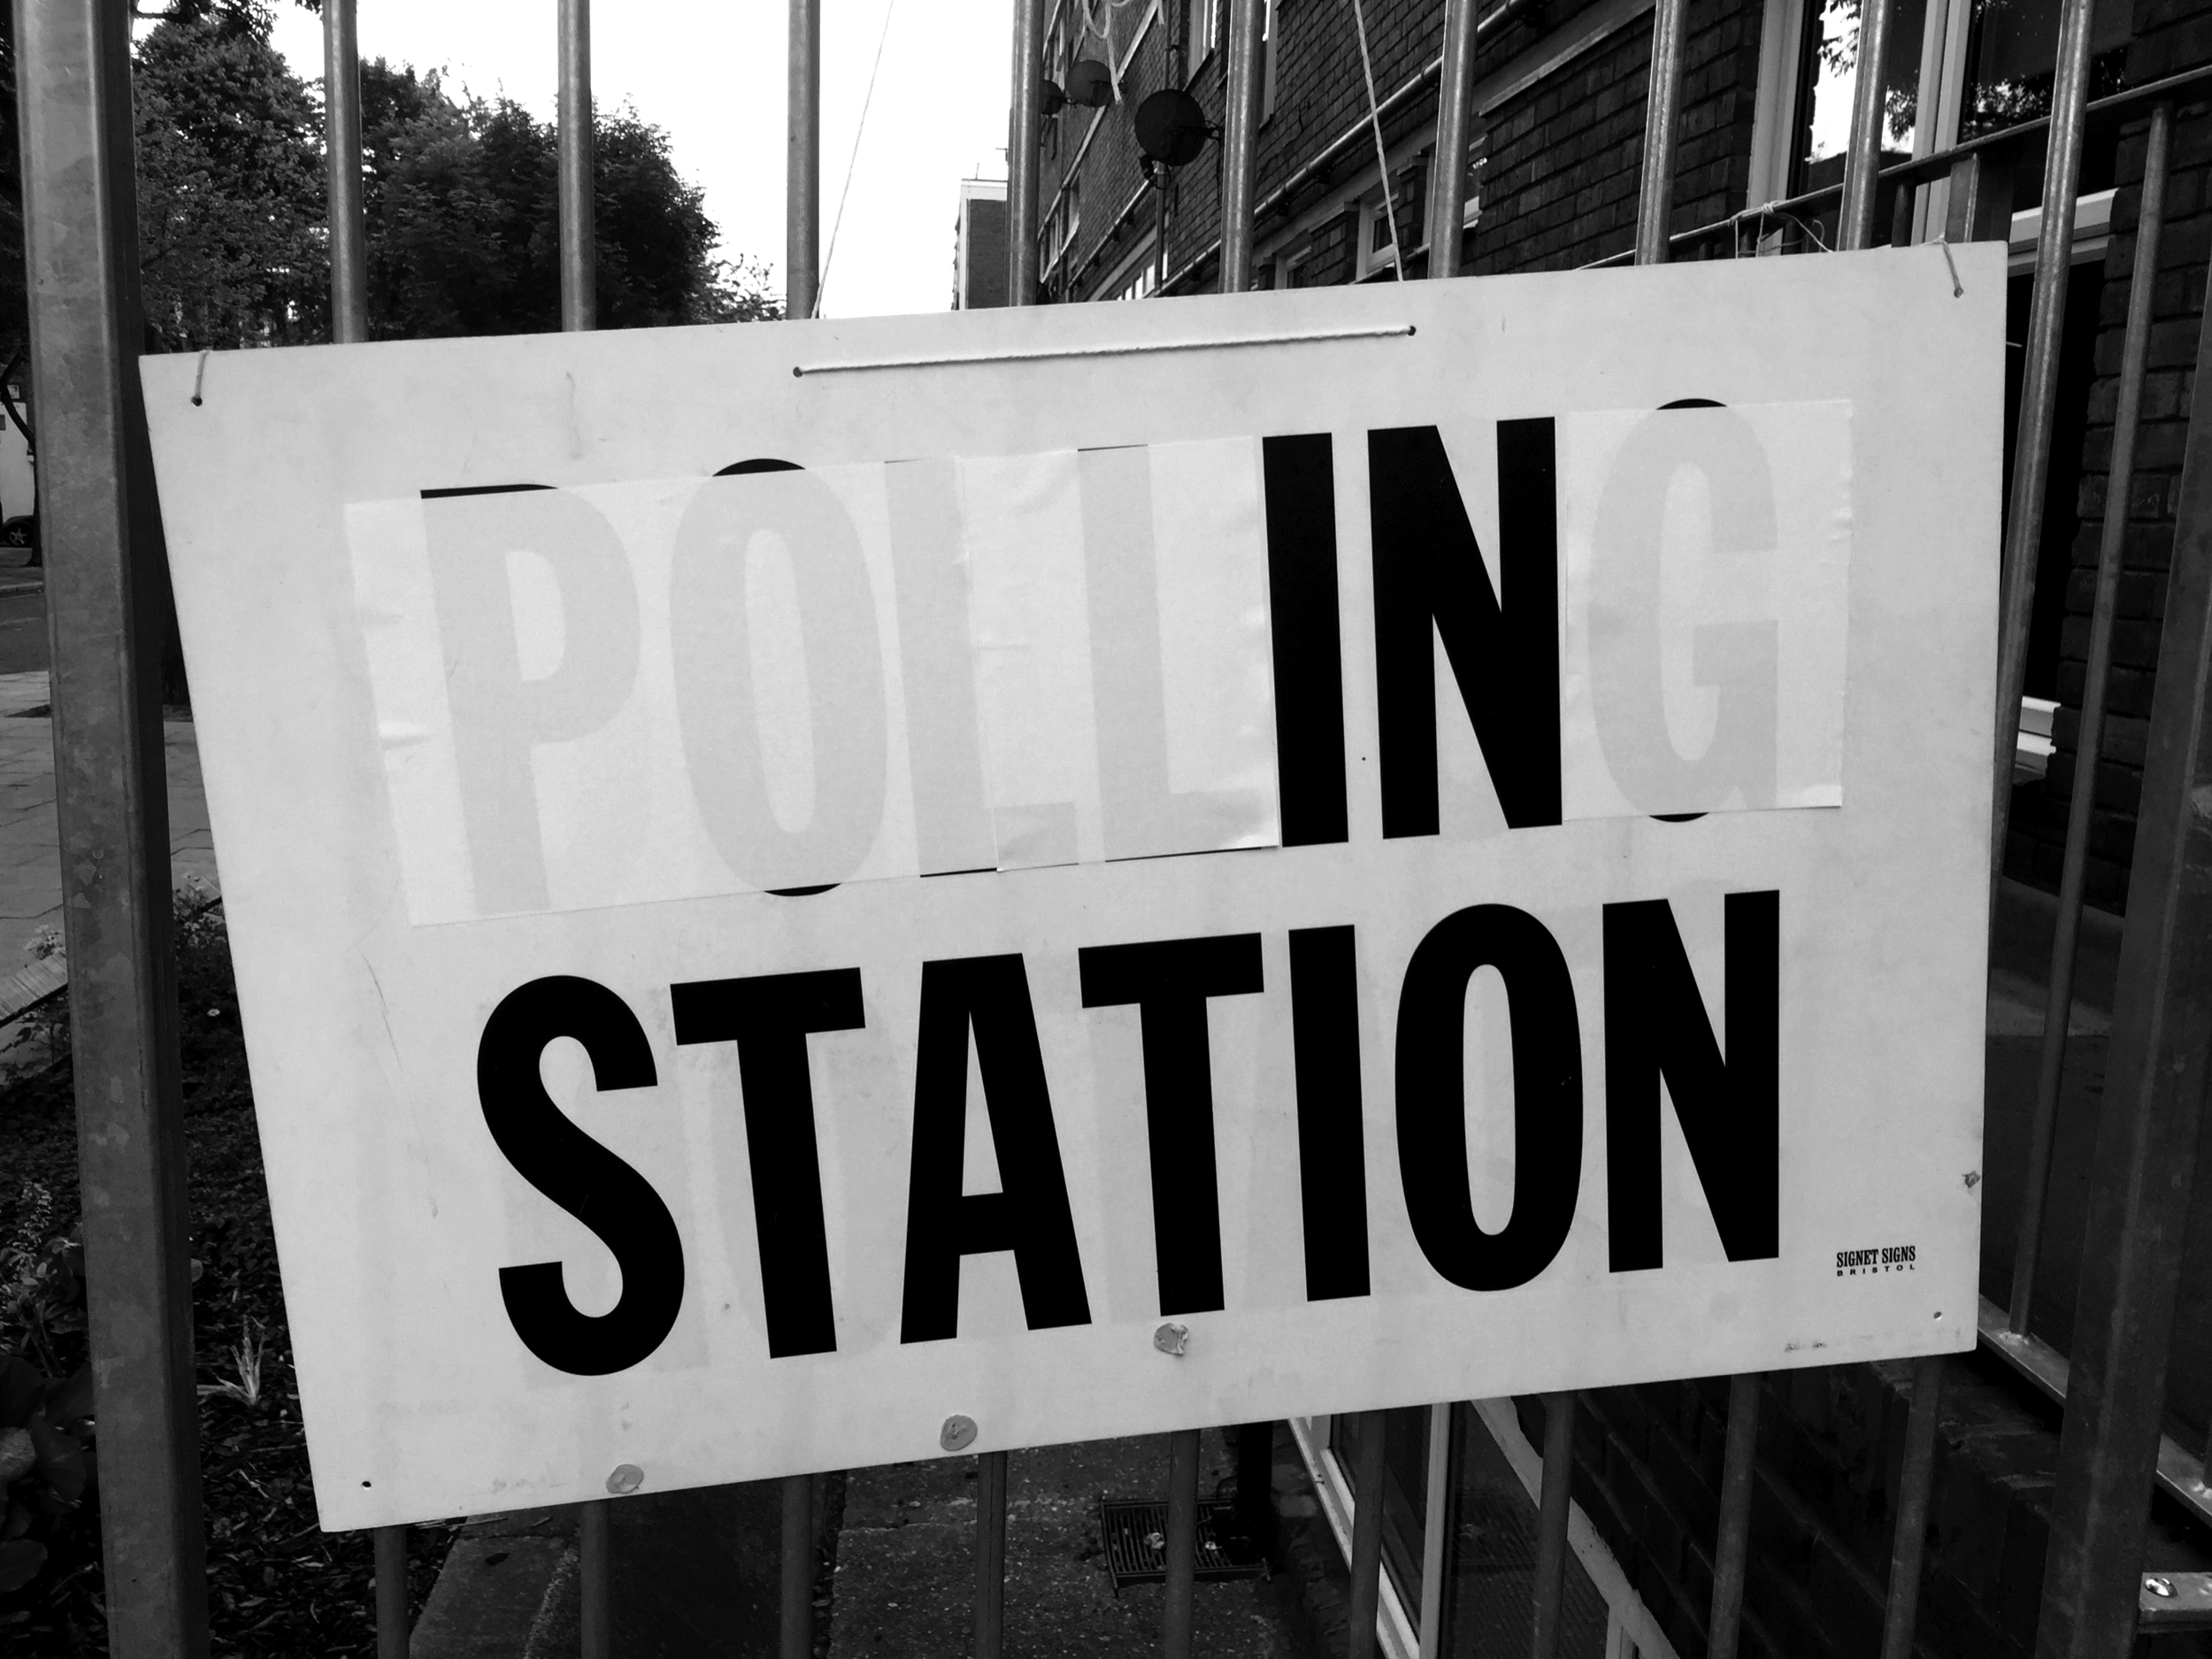 EU REFERENDUM \ POLLING STATION \ CALEDONIAN ROAD \ 23.6.2K16 #NOTESFROMUNDERGROUND #PUNKLONDON  #  SNUFFCREATIVE2016